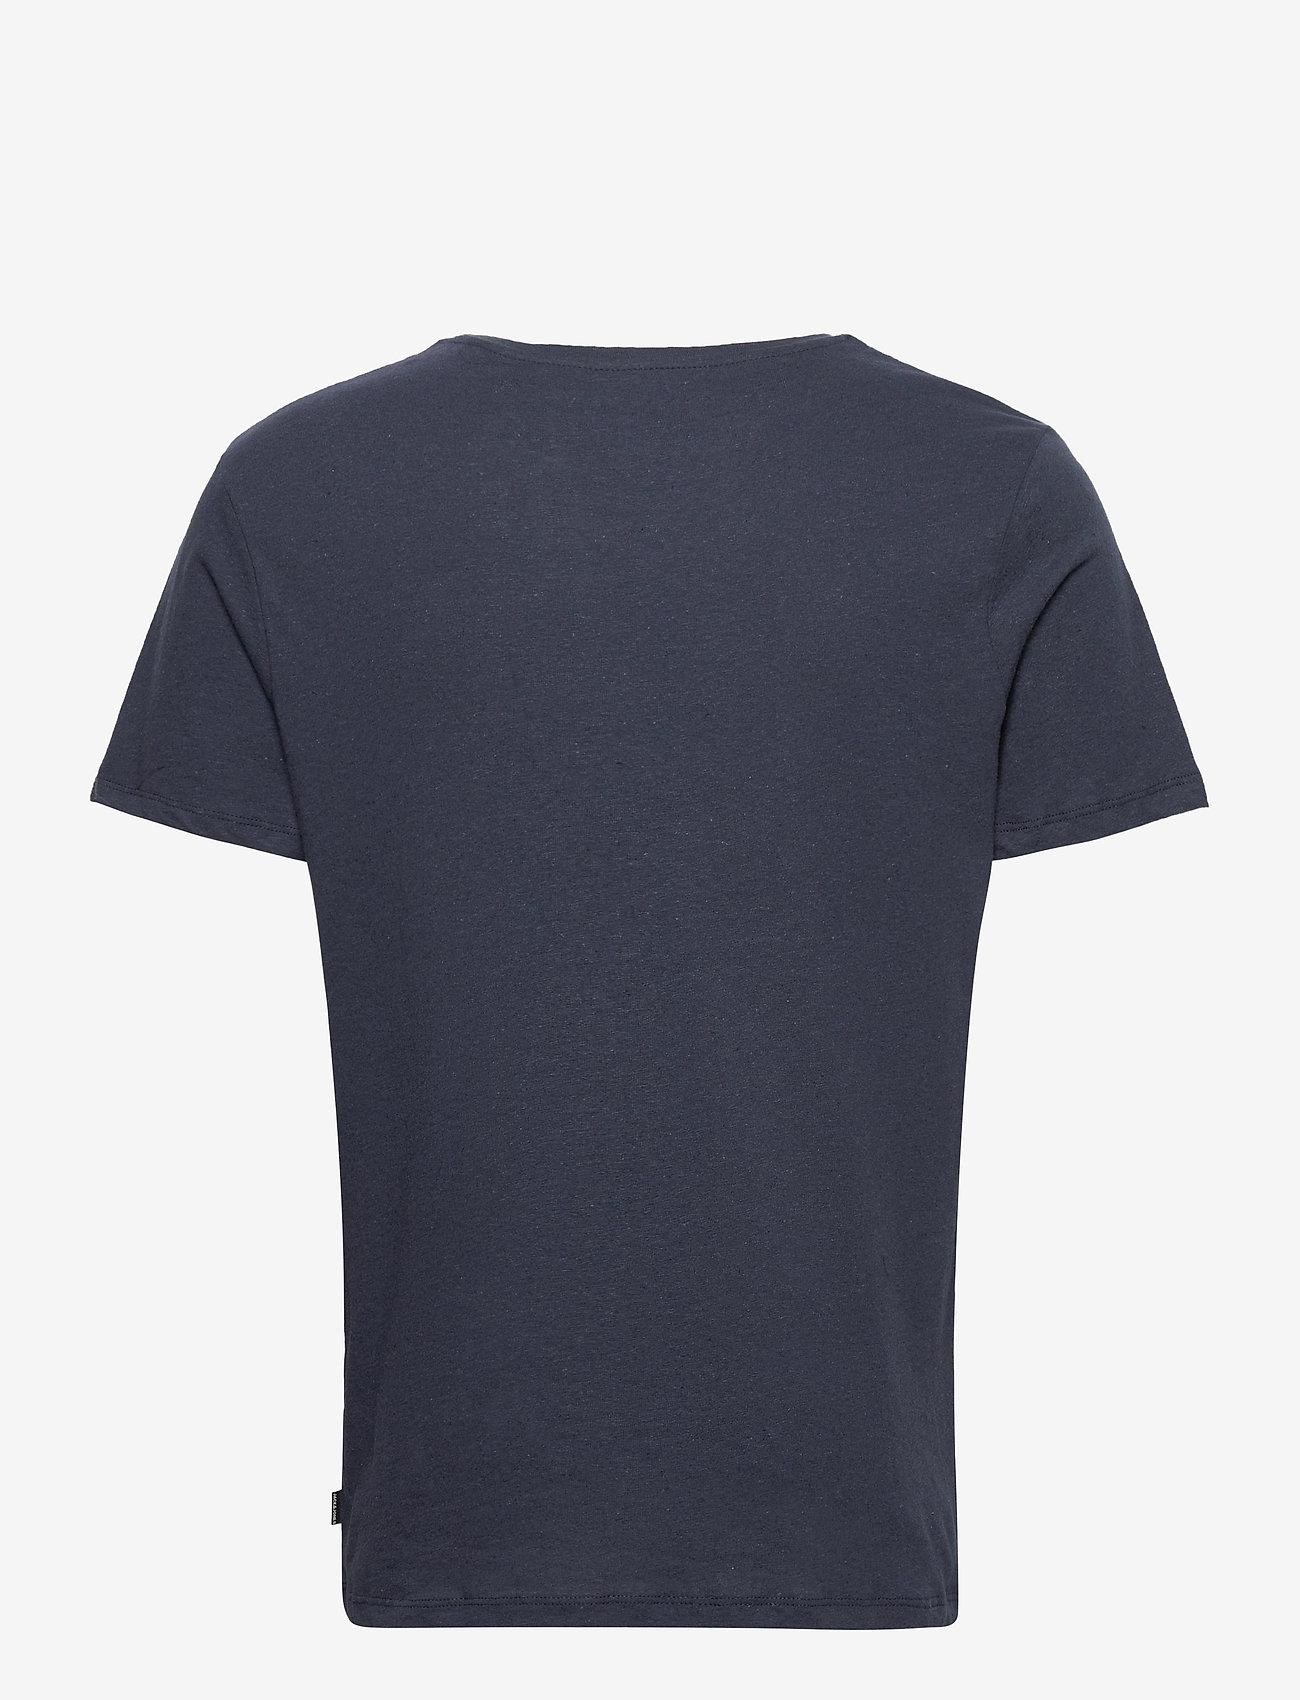 Jack & Jones - JJELINEN BASIC TEE SS CREW NECK STS - basic t-shirts - navy blazer - 1